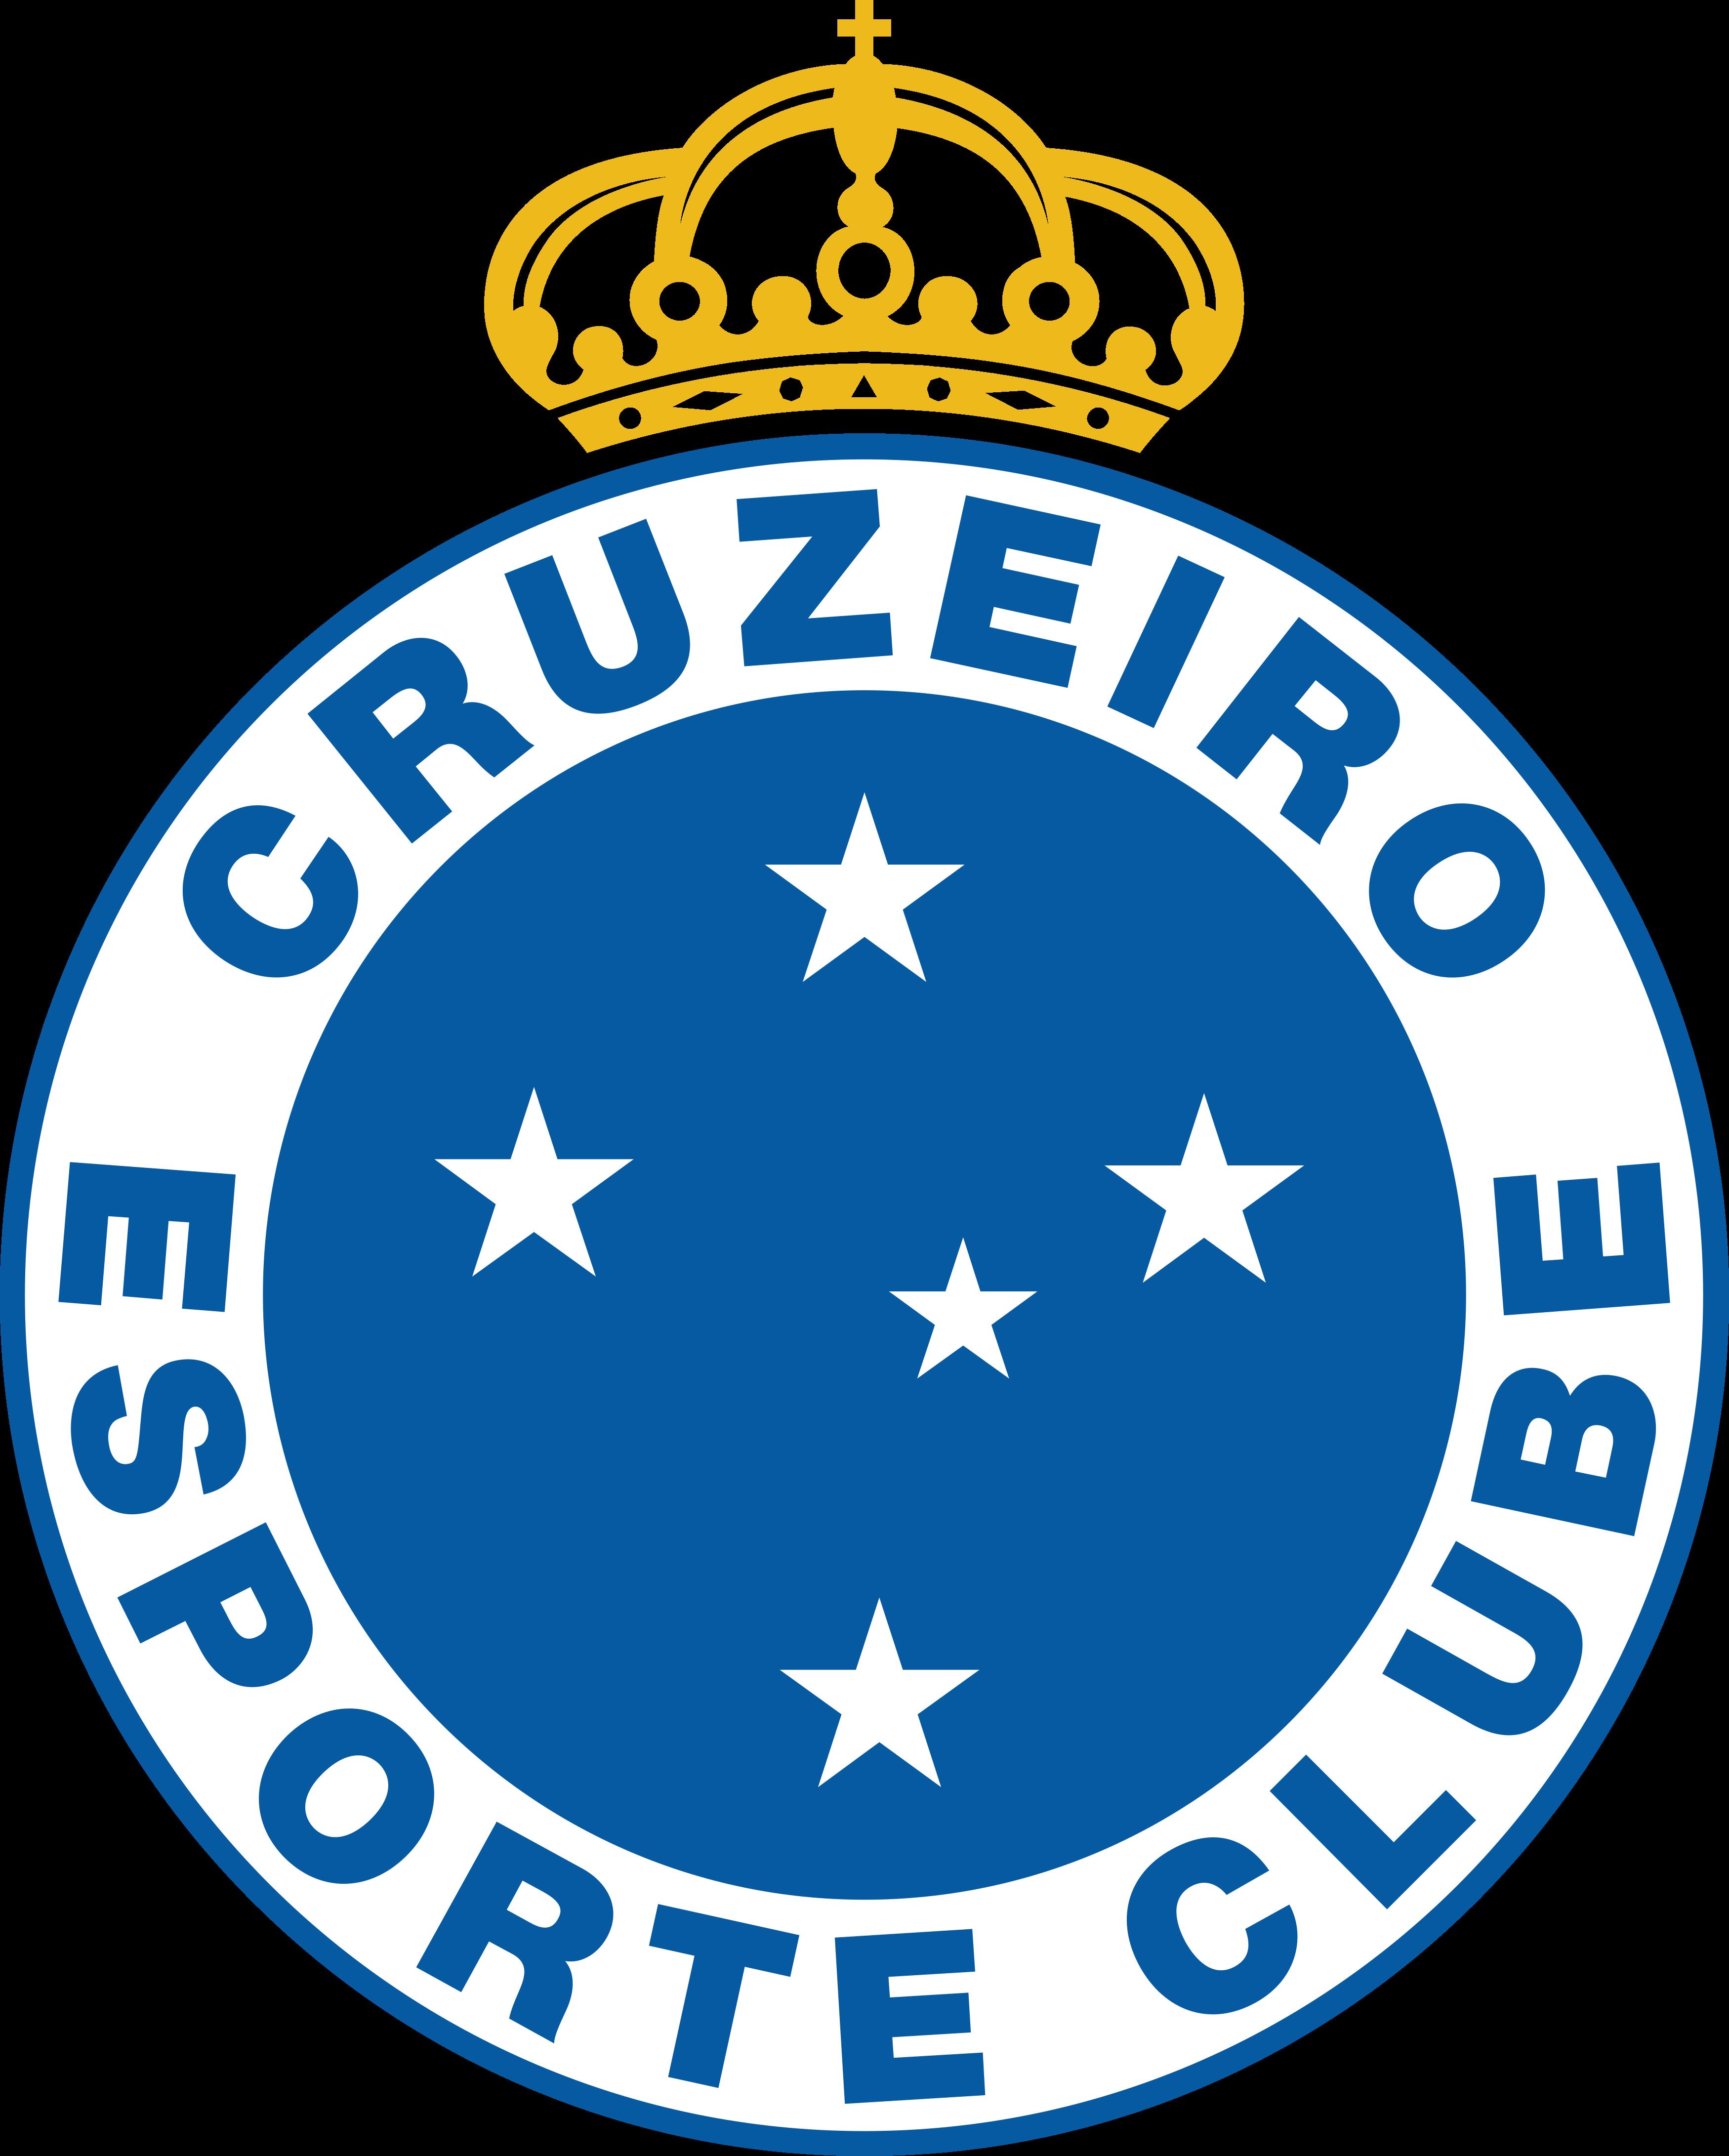 cruzeiro logo escudo  - Cruzeiro Logo - Escudo